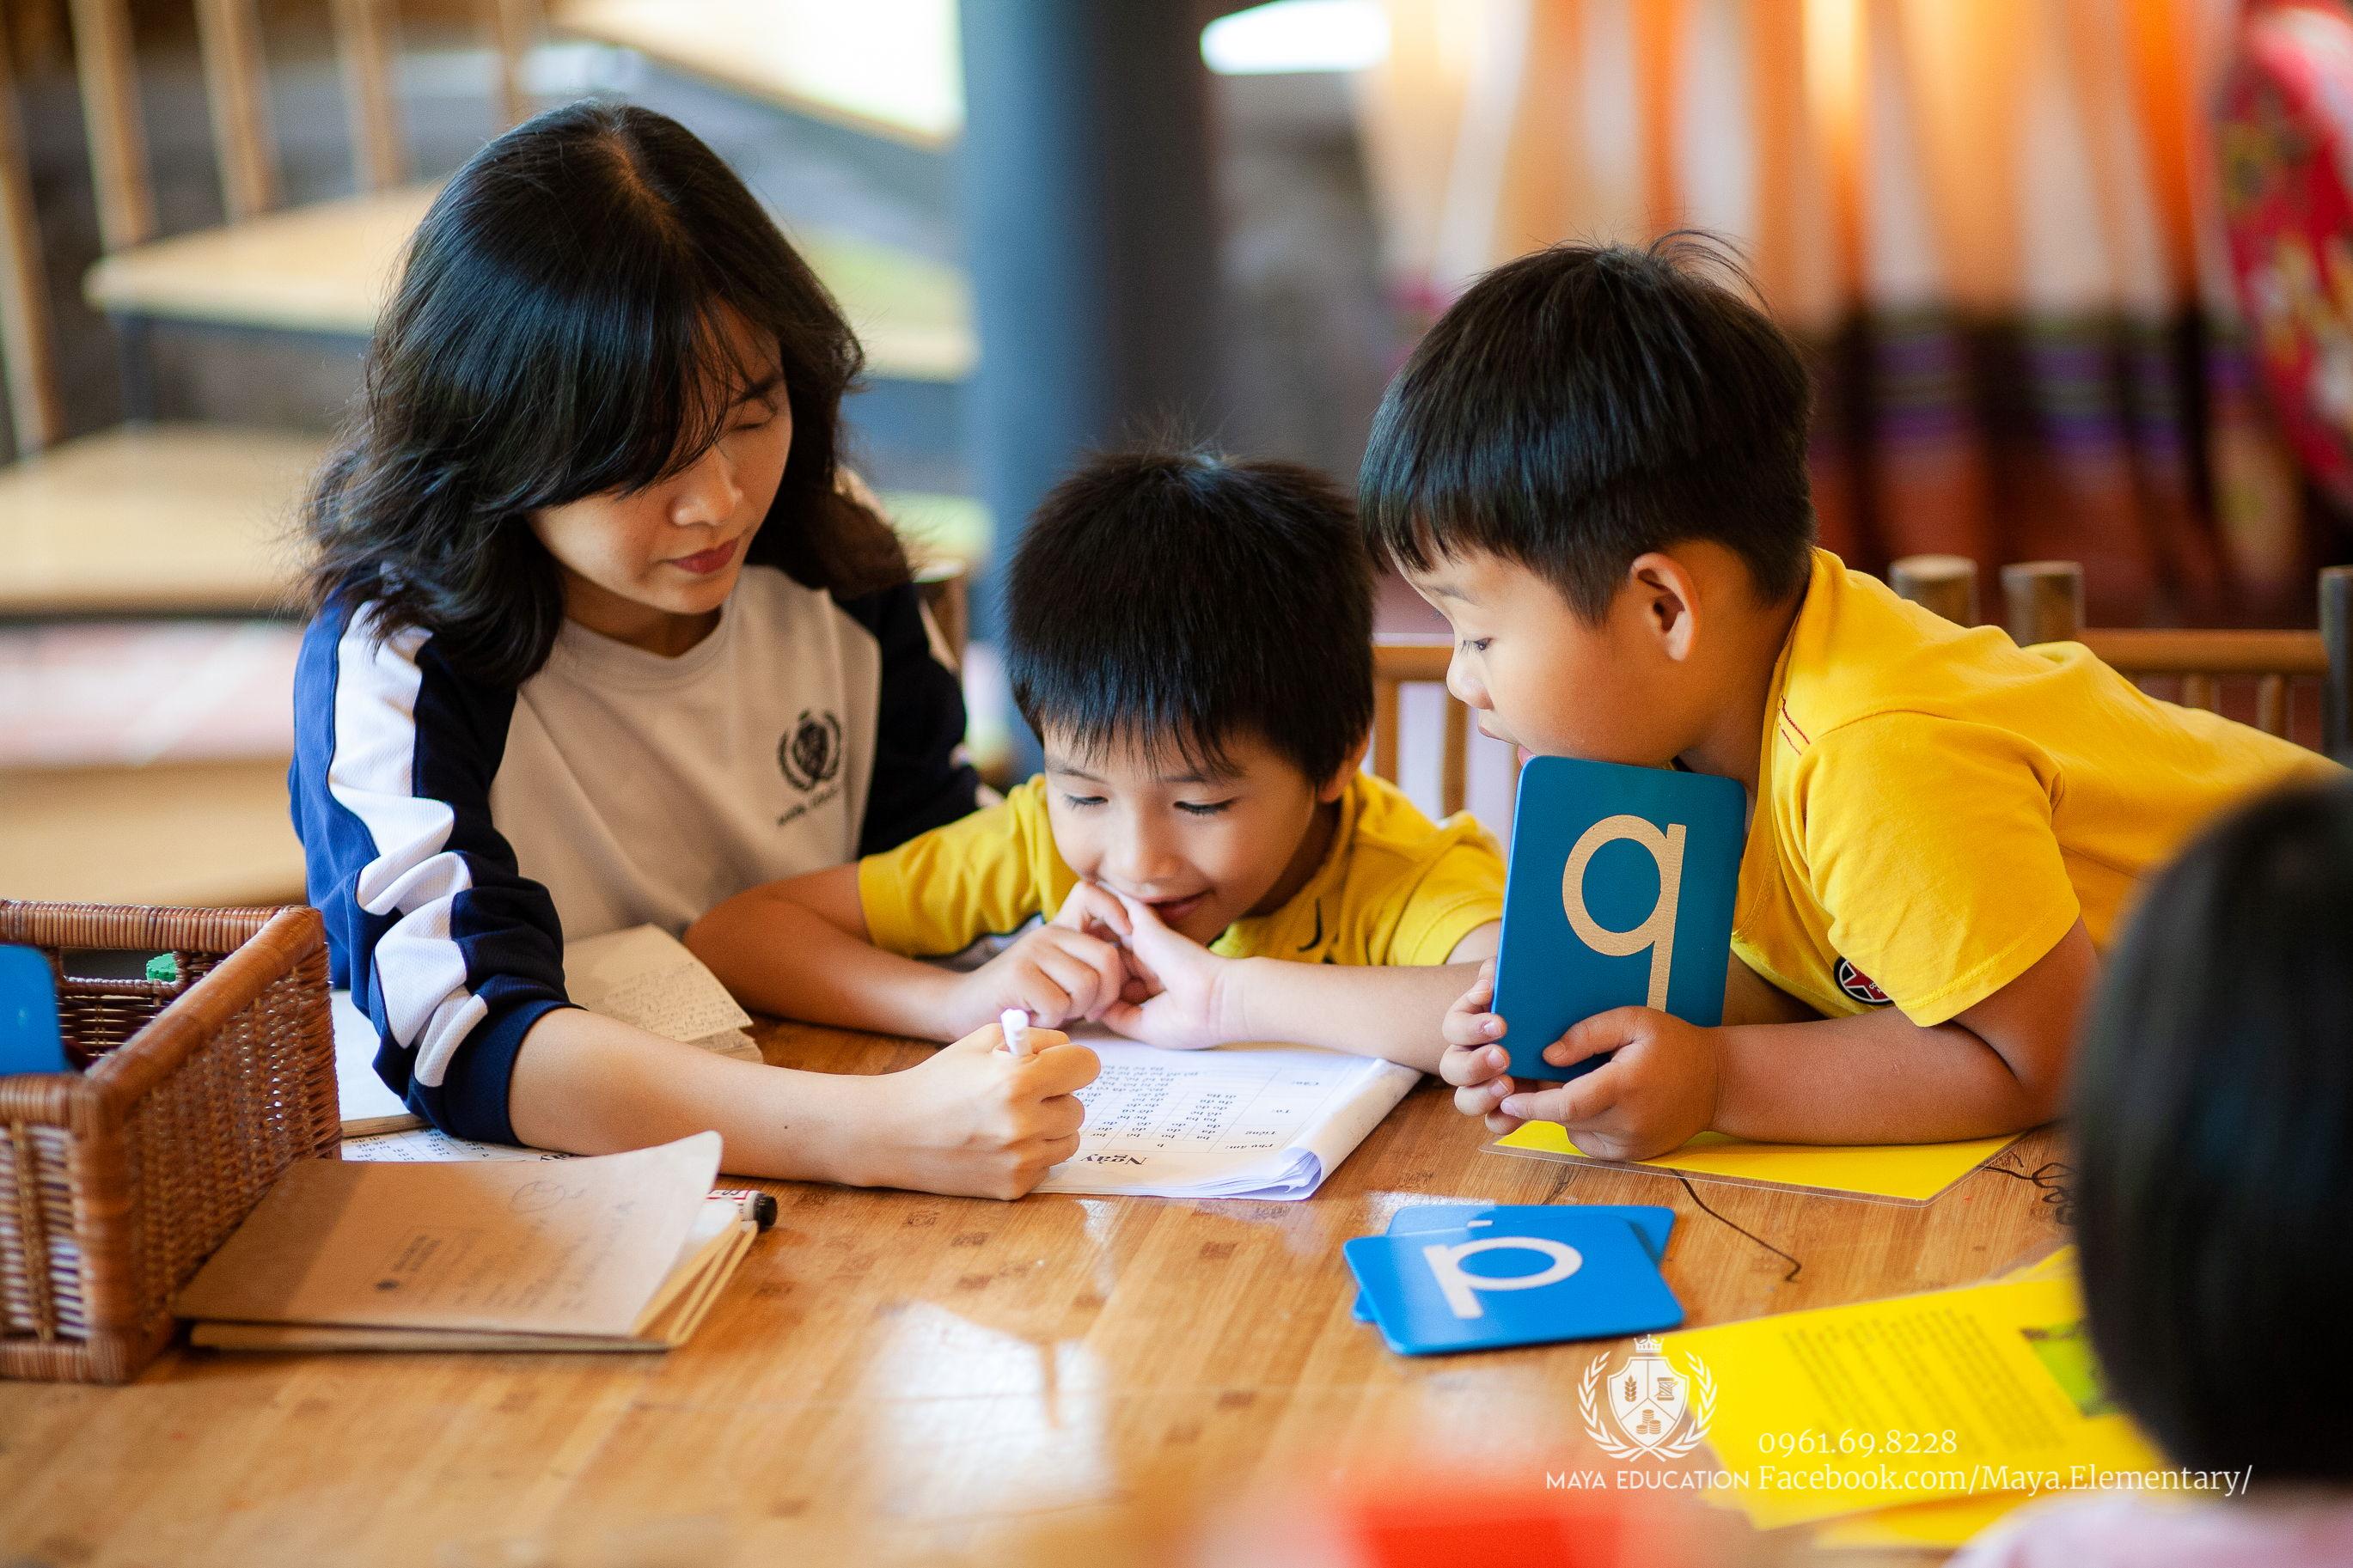 Kỷ luật trong lớp học Montessori (Phần 1/2)